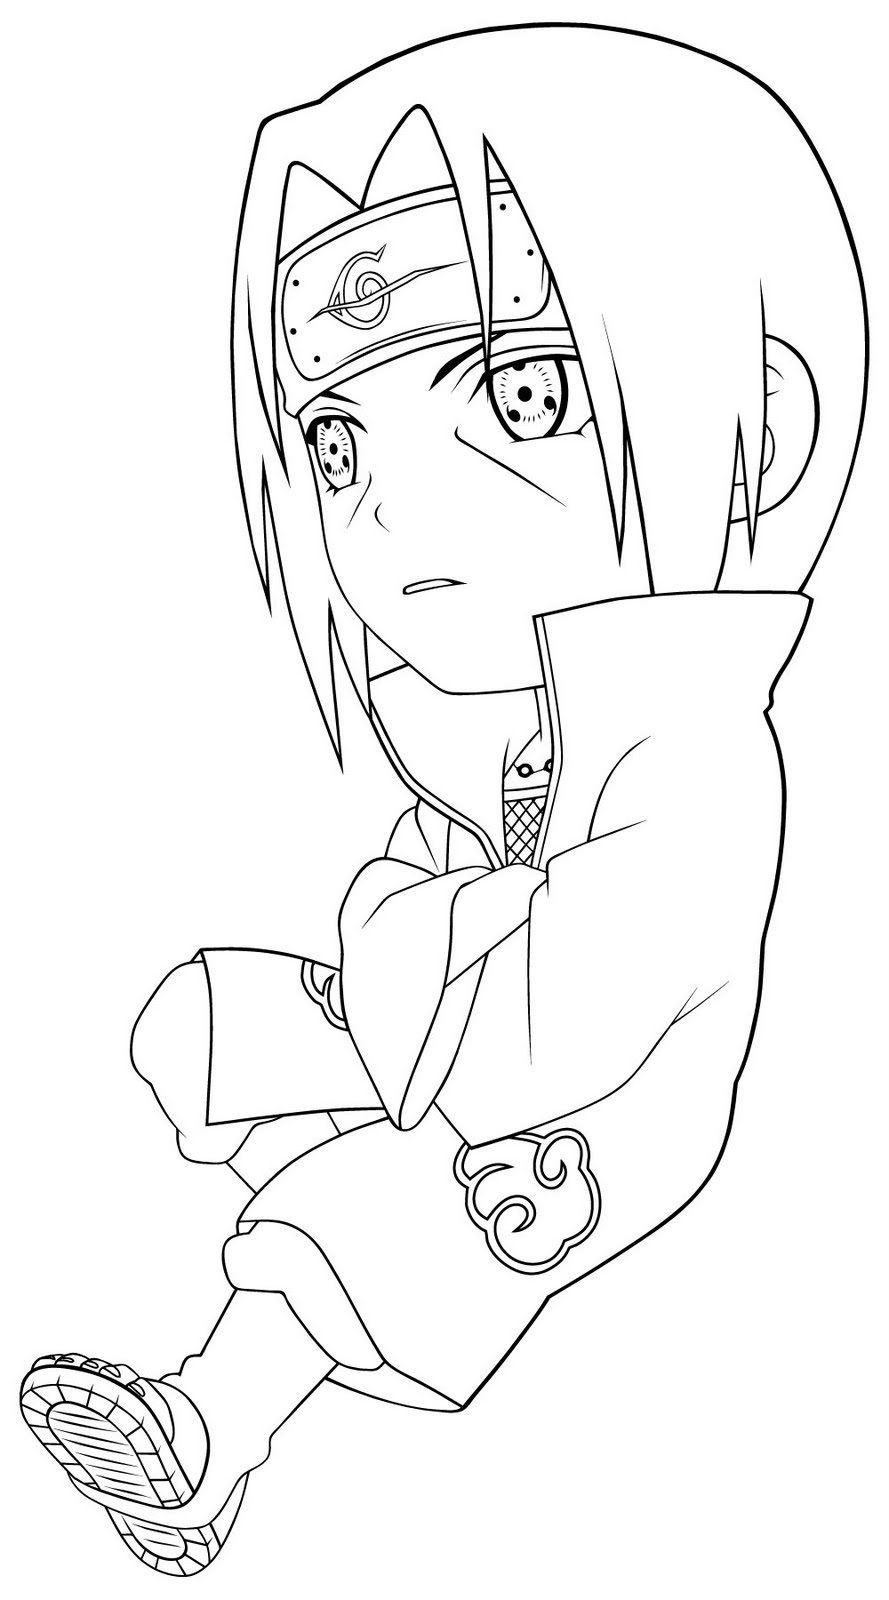 Free Printable Coloring Pages For Kids Kid Naruto Naruto Sketch Naruto Sketch Drawing